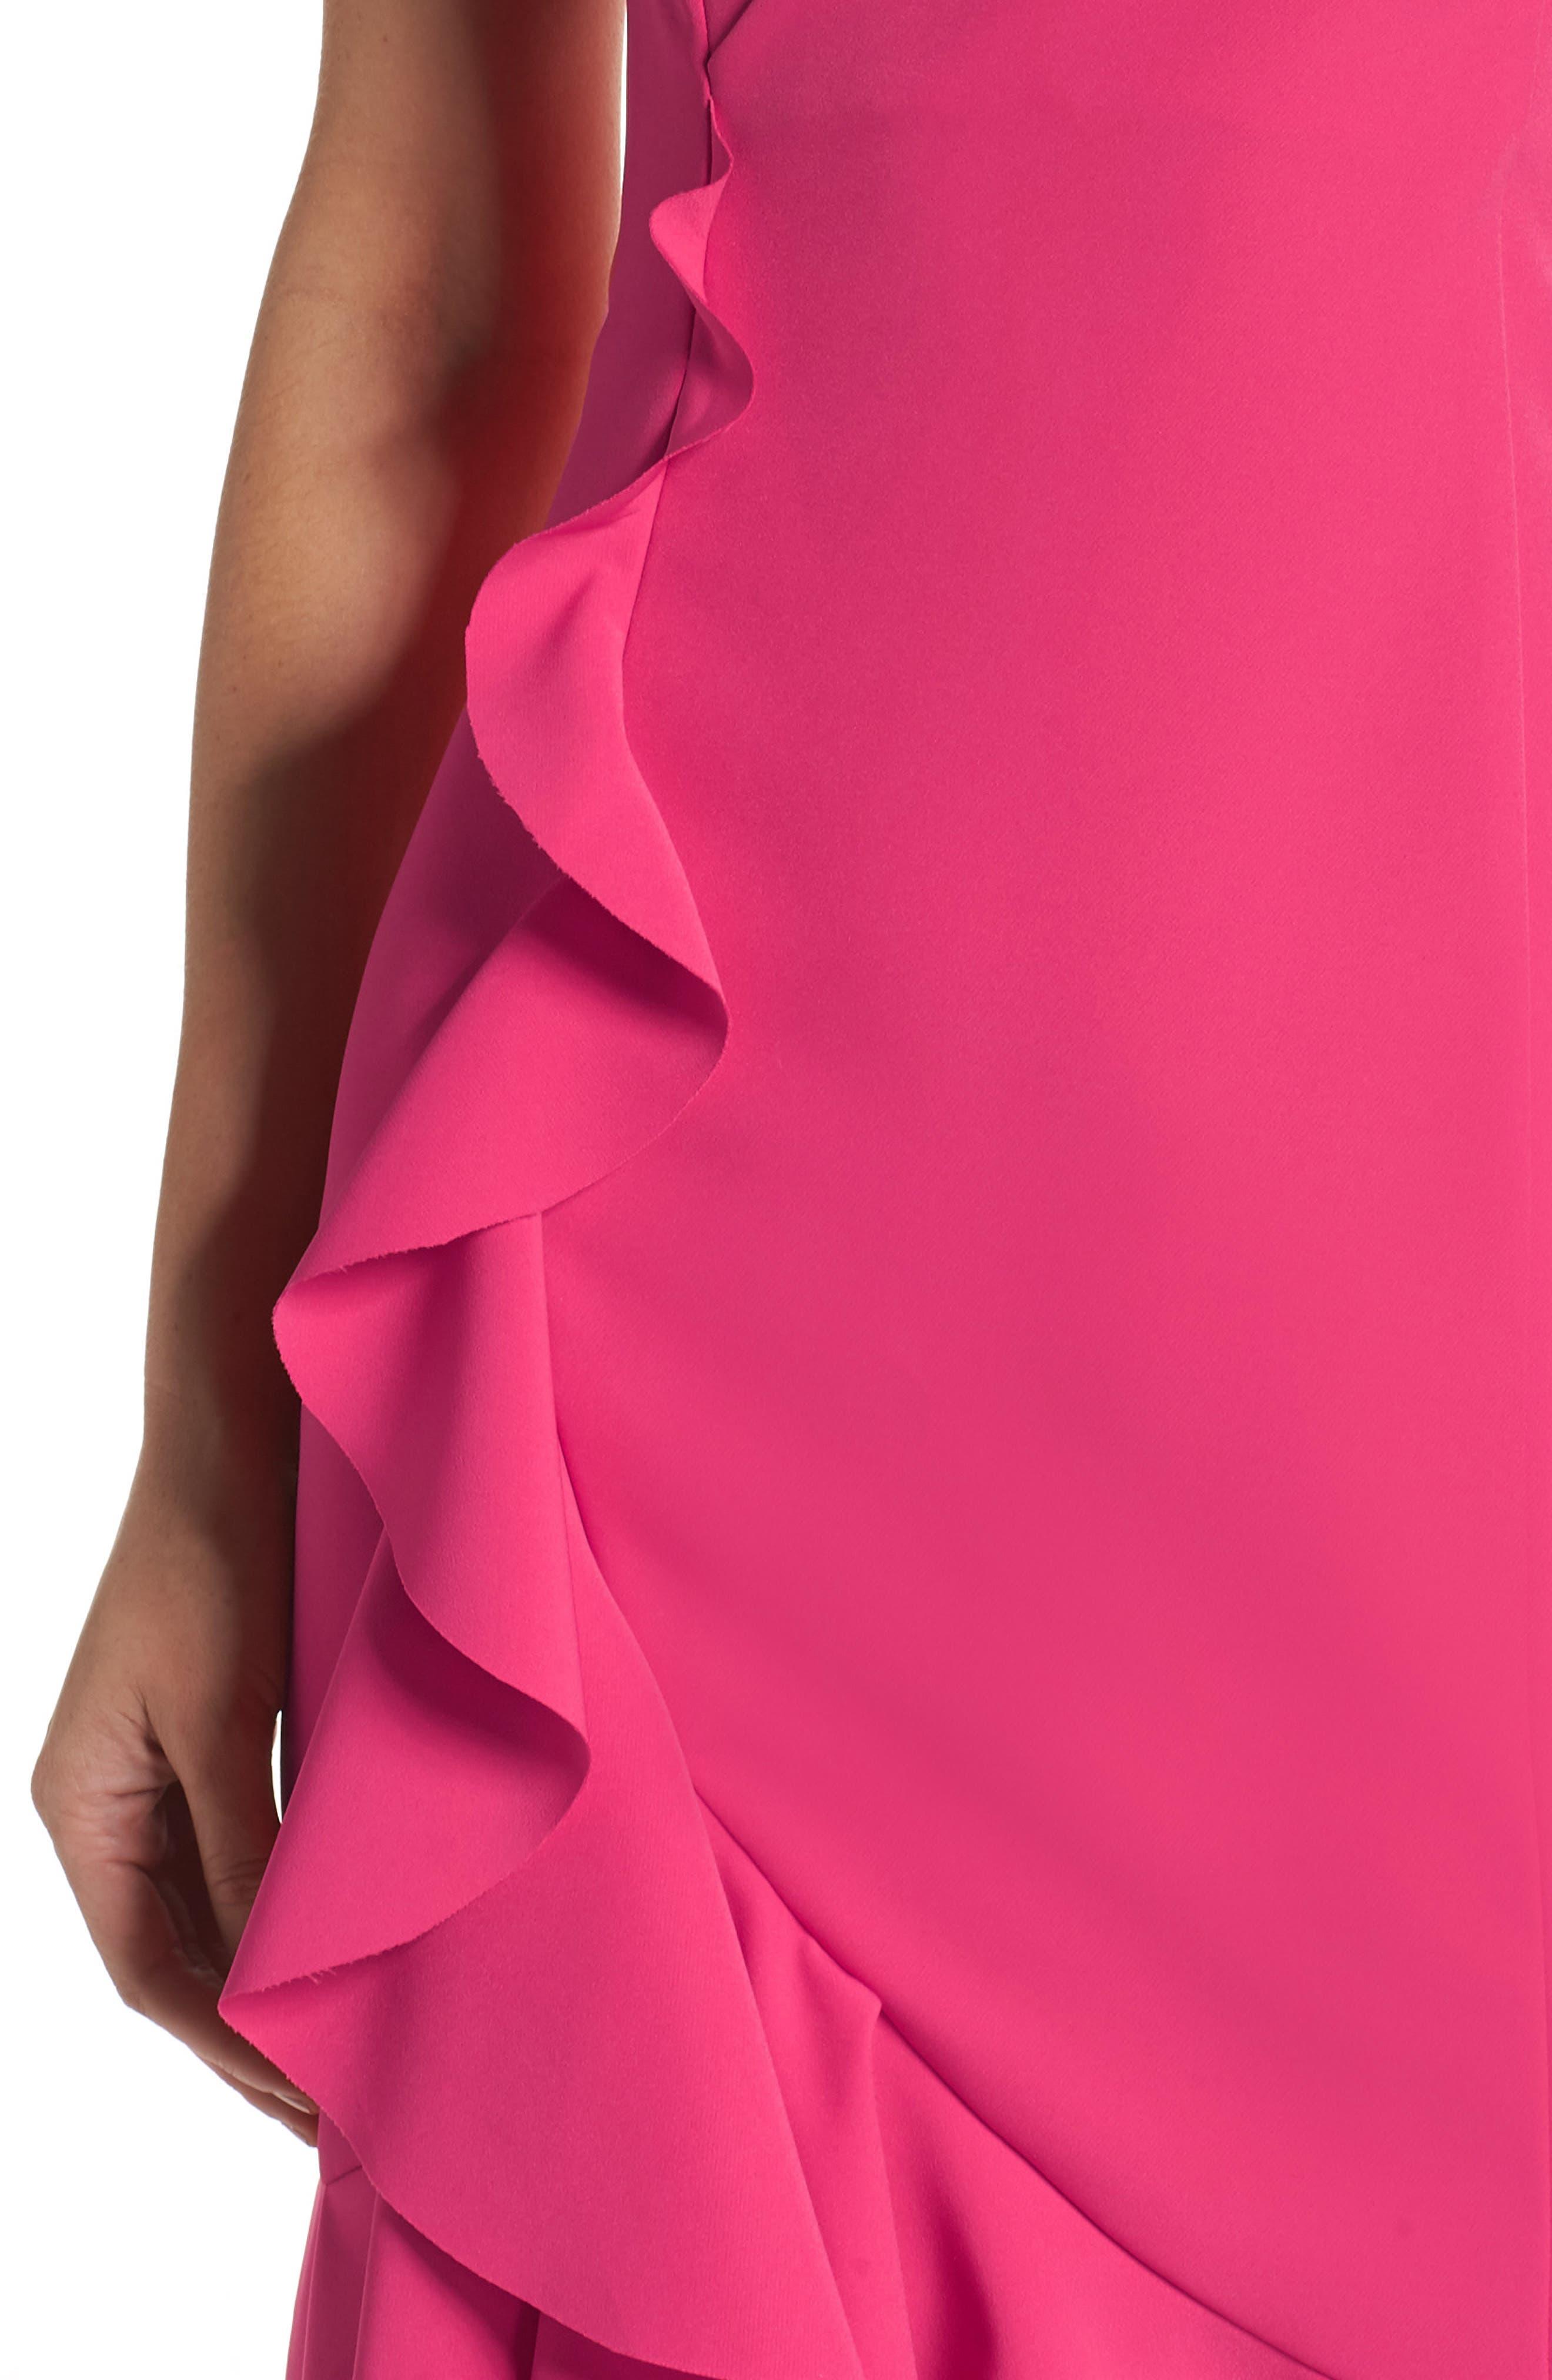 Laguna Ruffle Sheath Dress,                             Alternate thumbnail 4, color,                             660